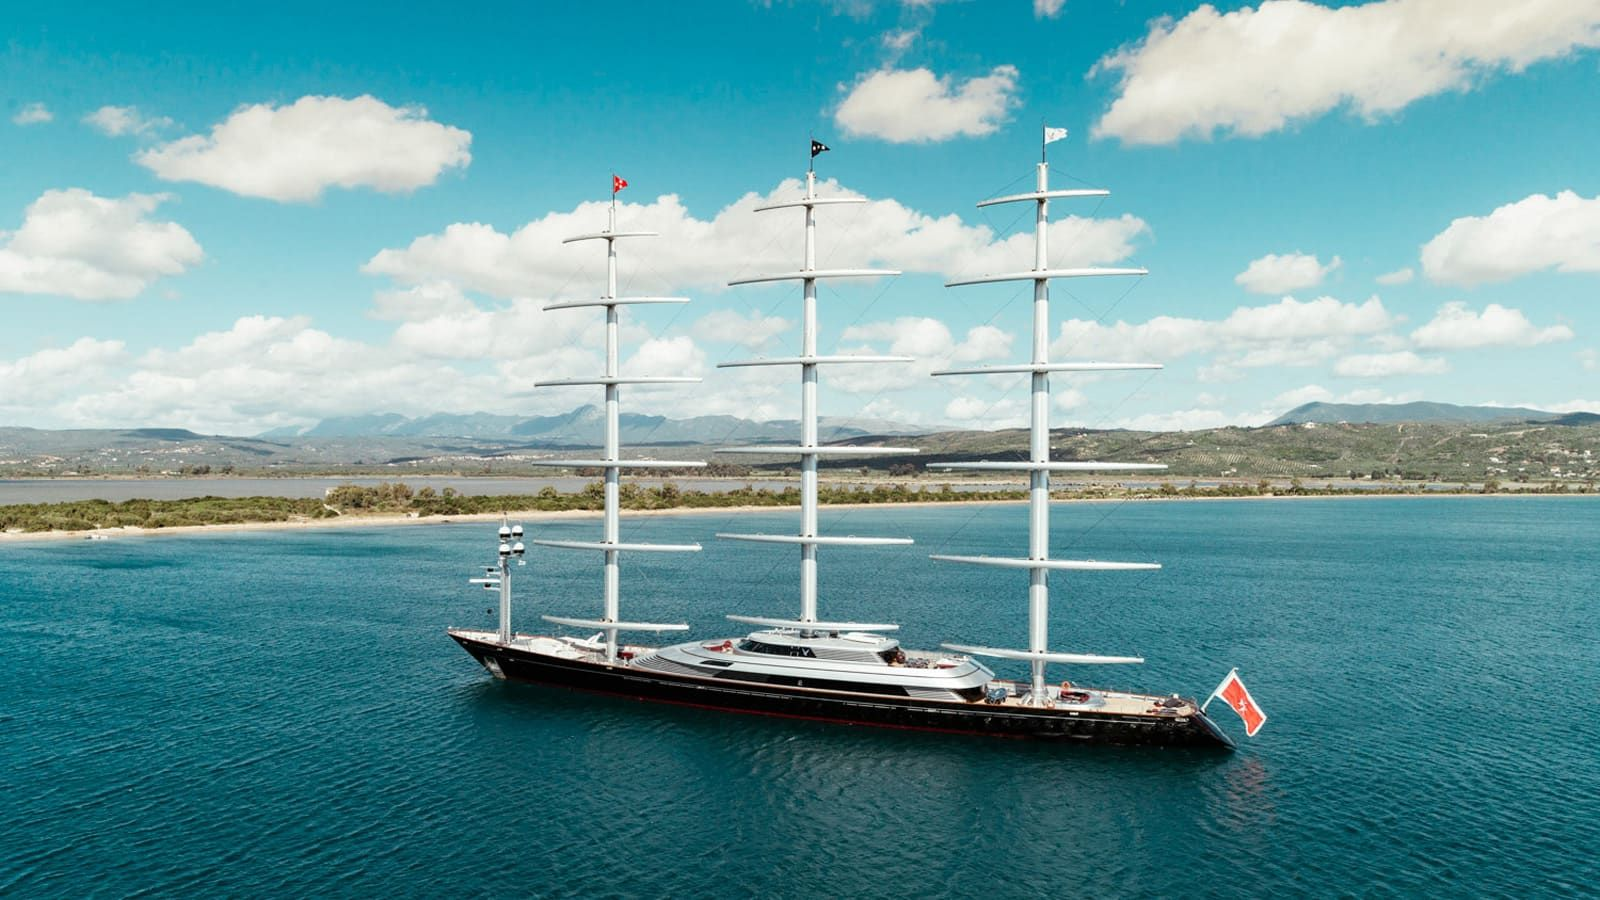 Mega Sailing Yacht Maltese Falcon Cruising The Sea And Ocean She Is Available For Charter Discover Monaco Croatia Greece South Of France Caribbean Onboard En 2020